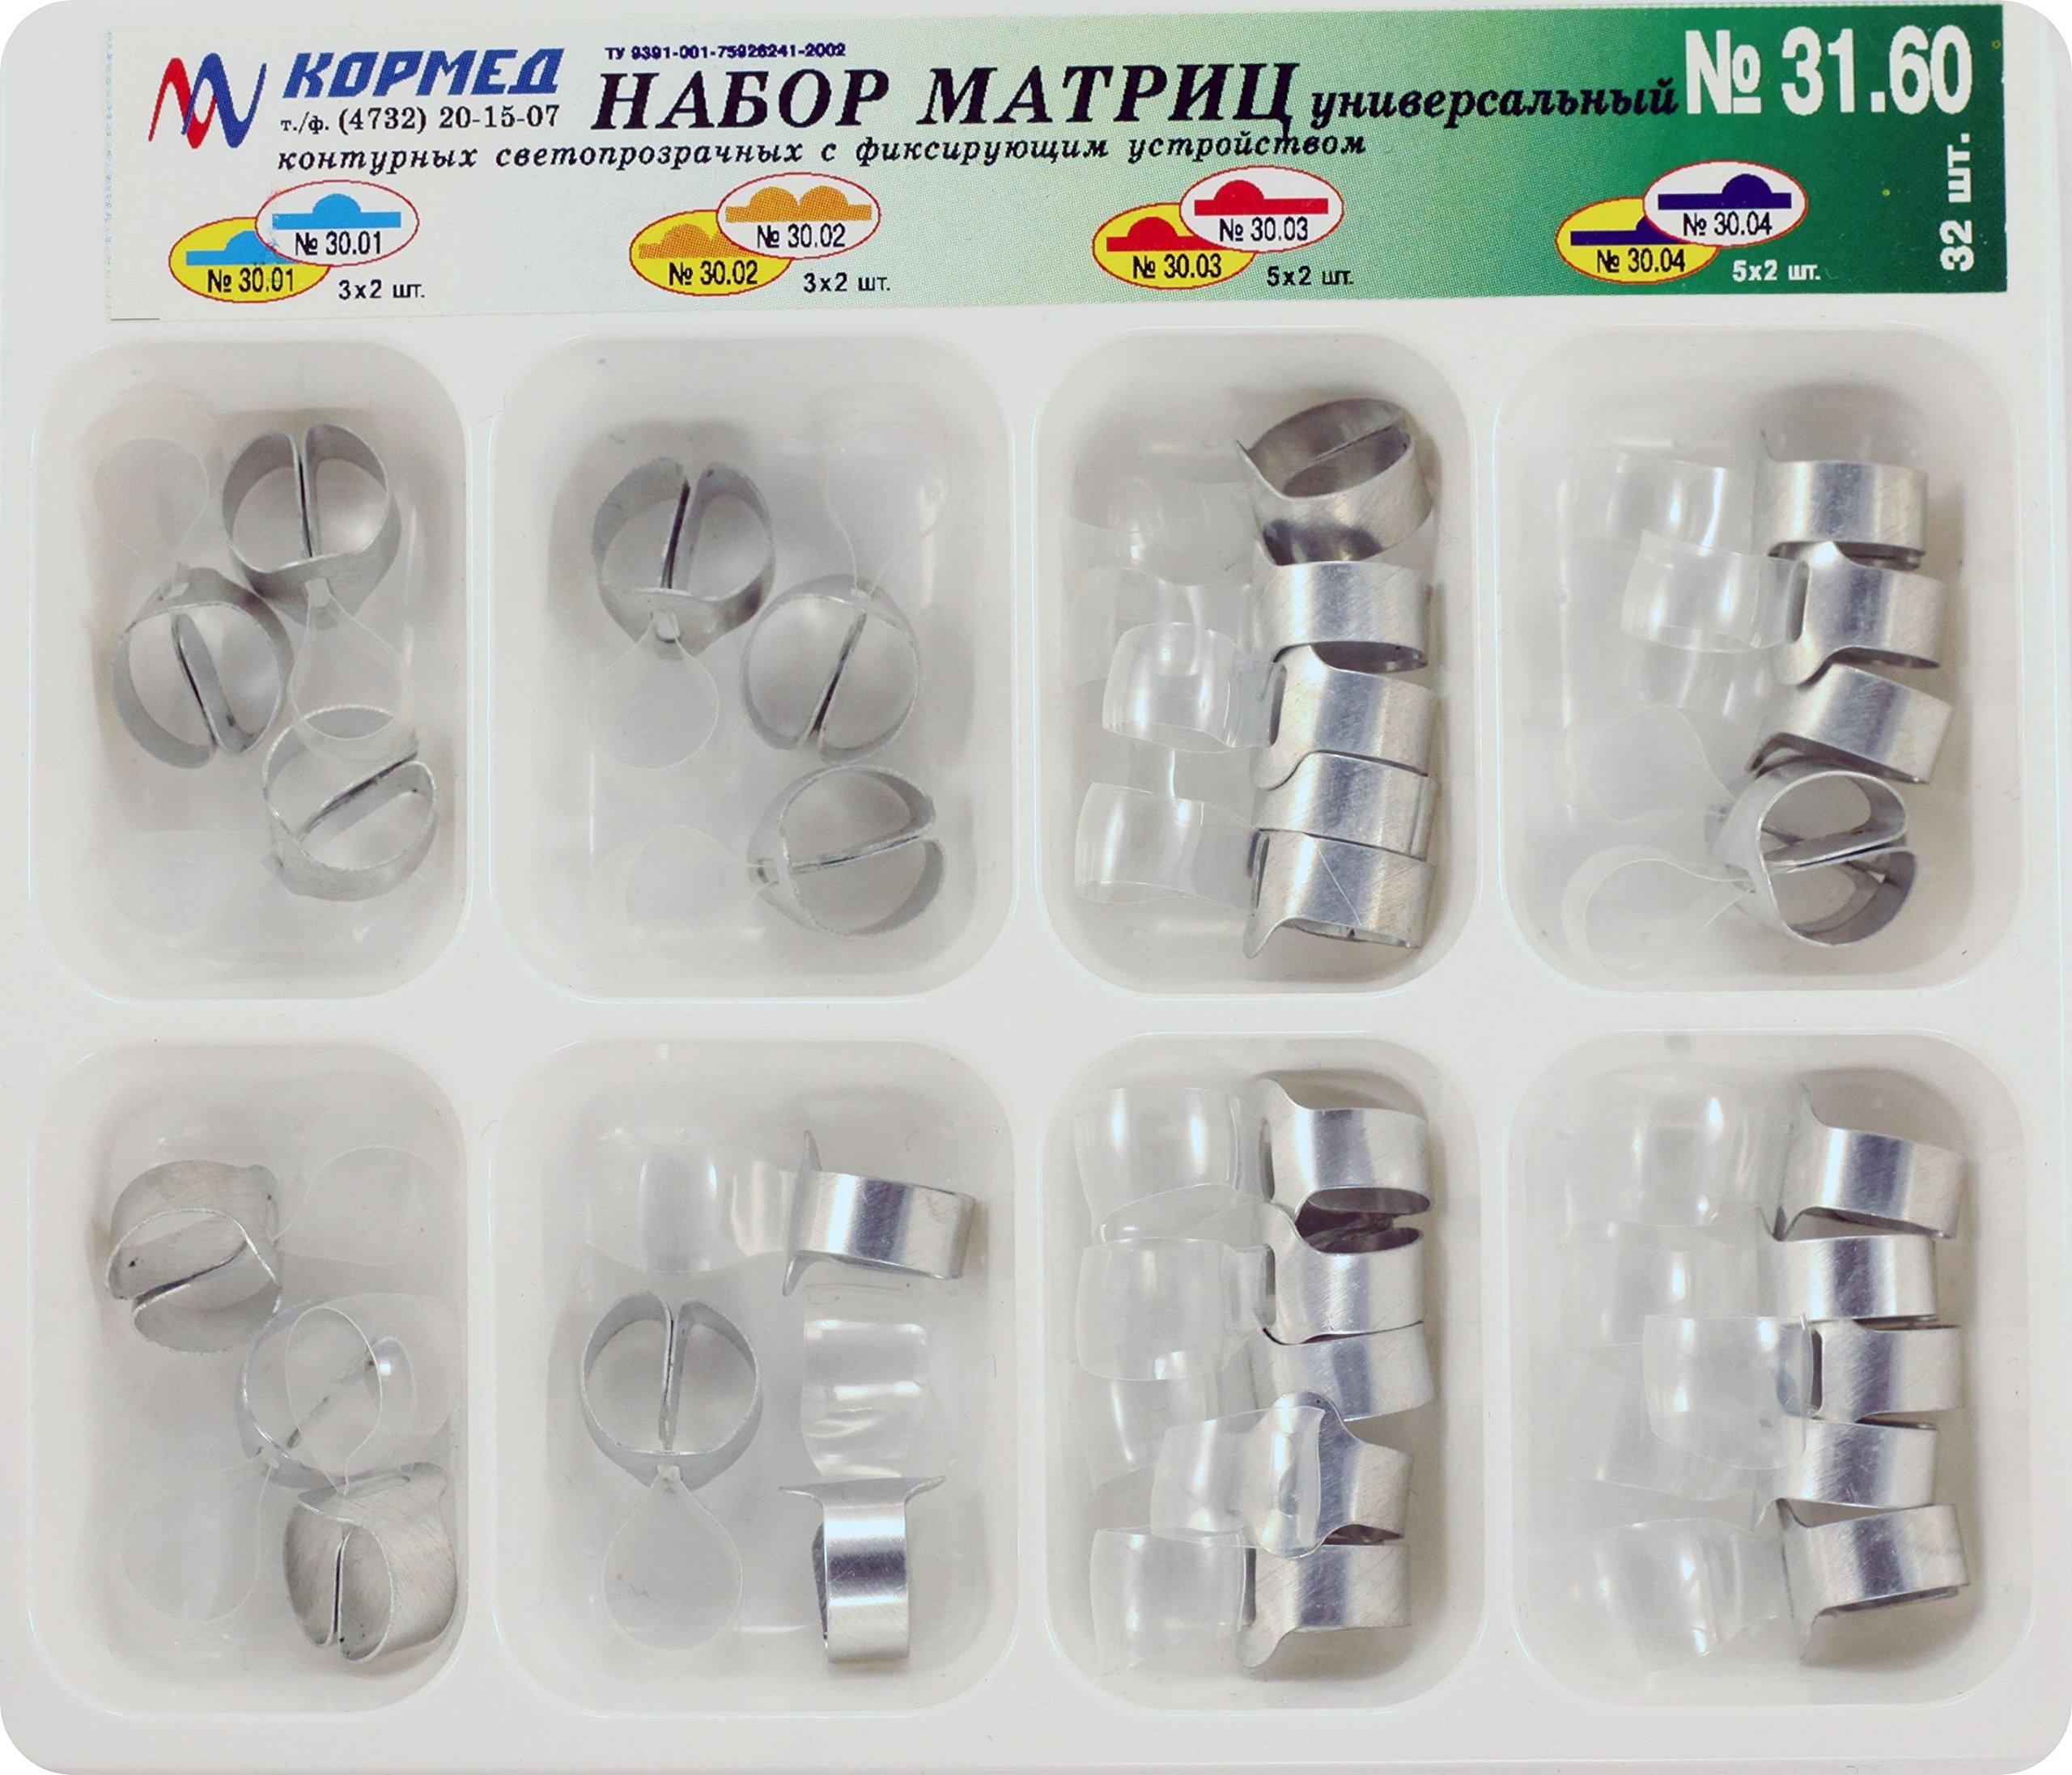 Dental Universal Kit of Transparent Contoured Matrix Matrices with Clamp 32 pcs Cormed